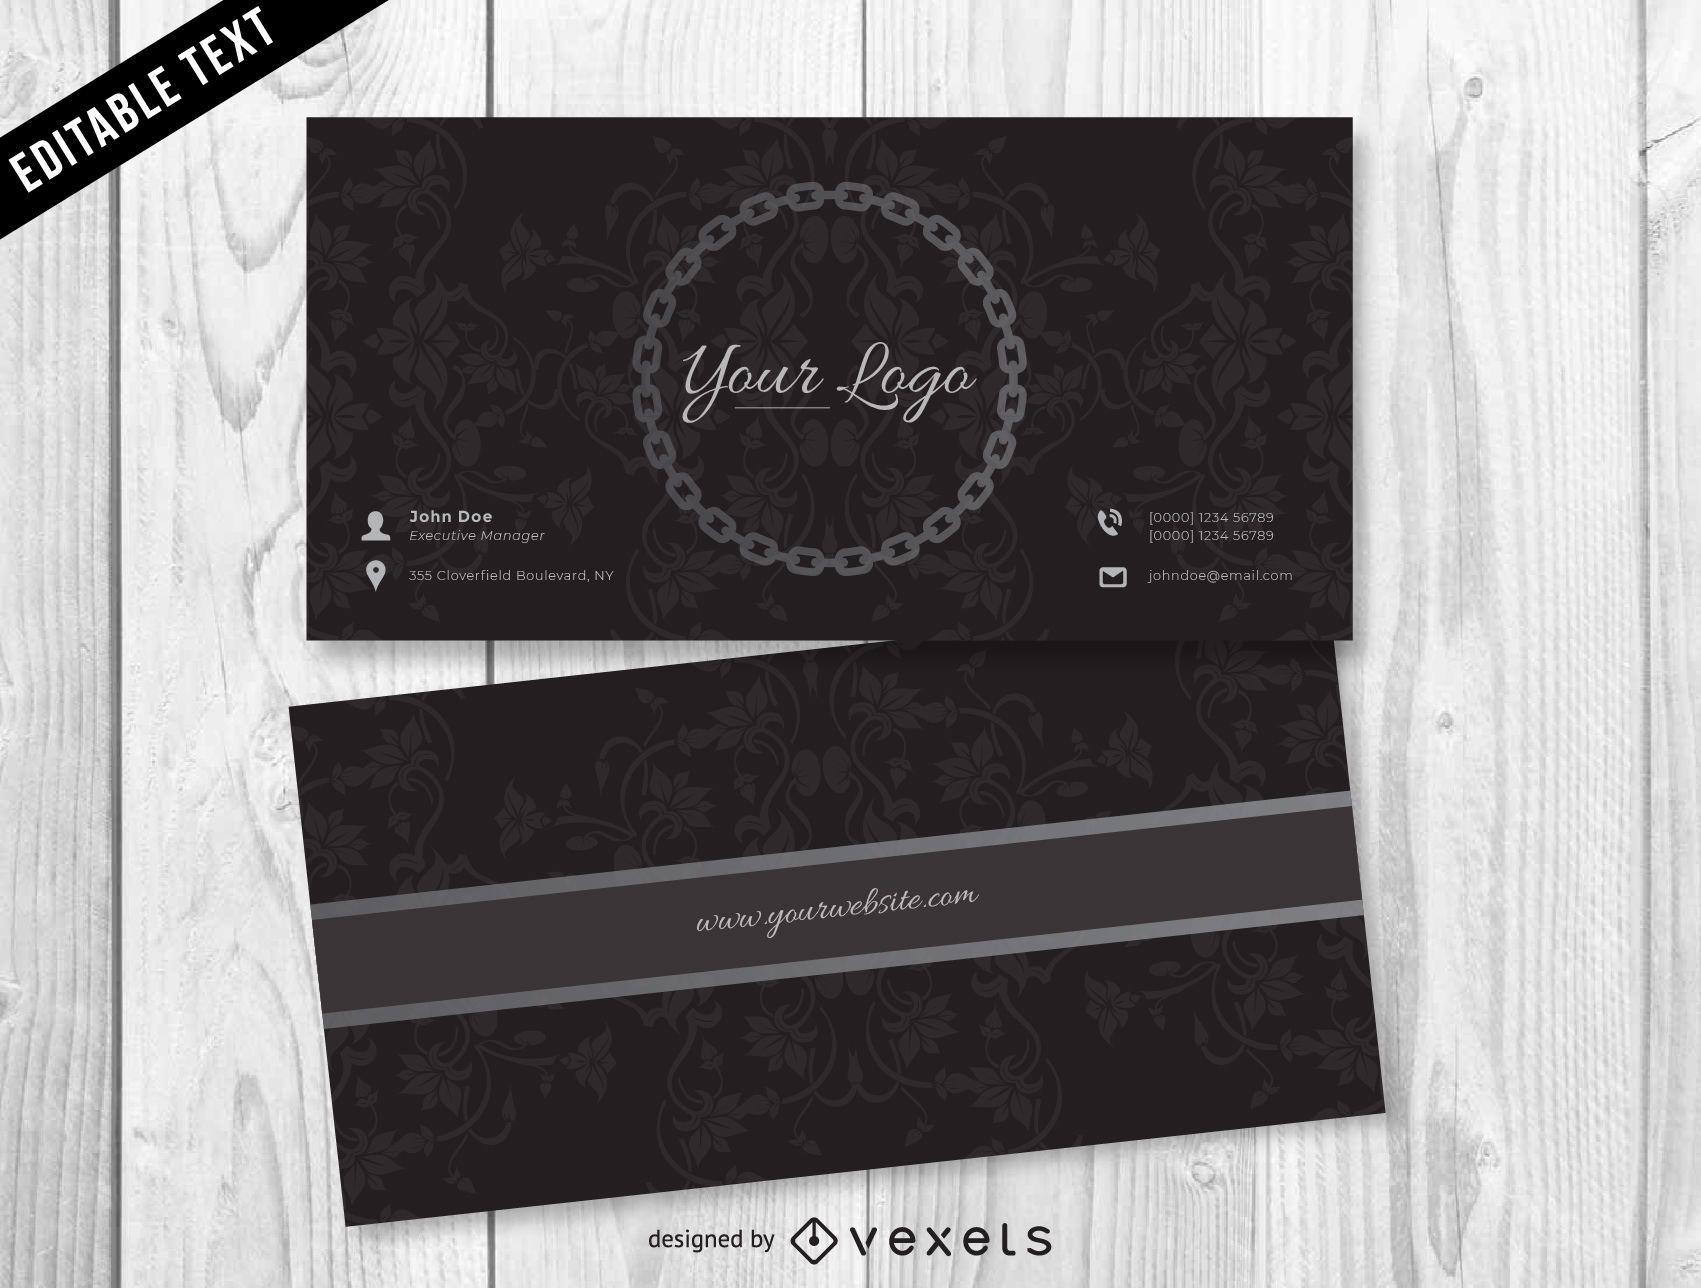 Diseño de Tarjeta de Presentación: Joyería oscura